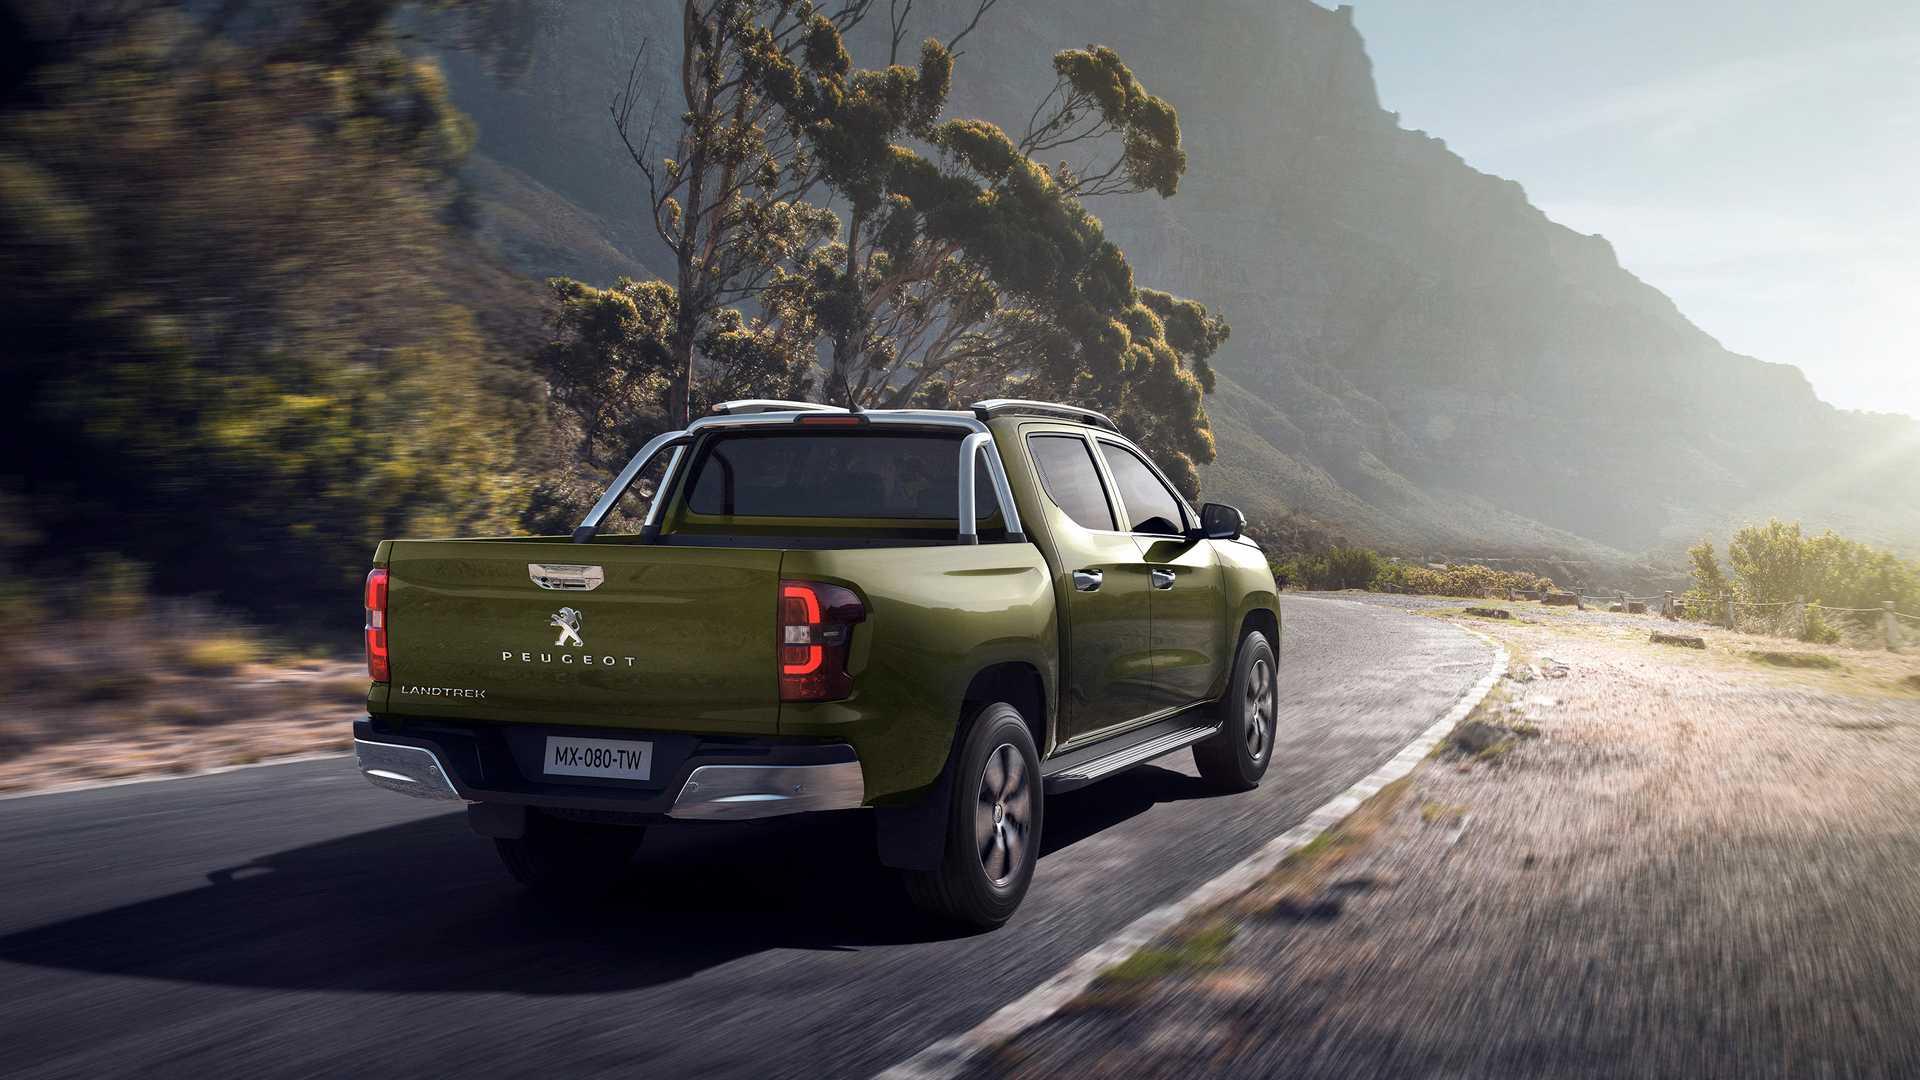 2021 Peugeot Landtrek Rear Three-Quarter Wallpapers (10)